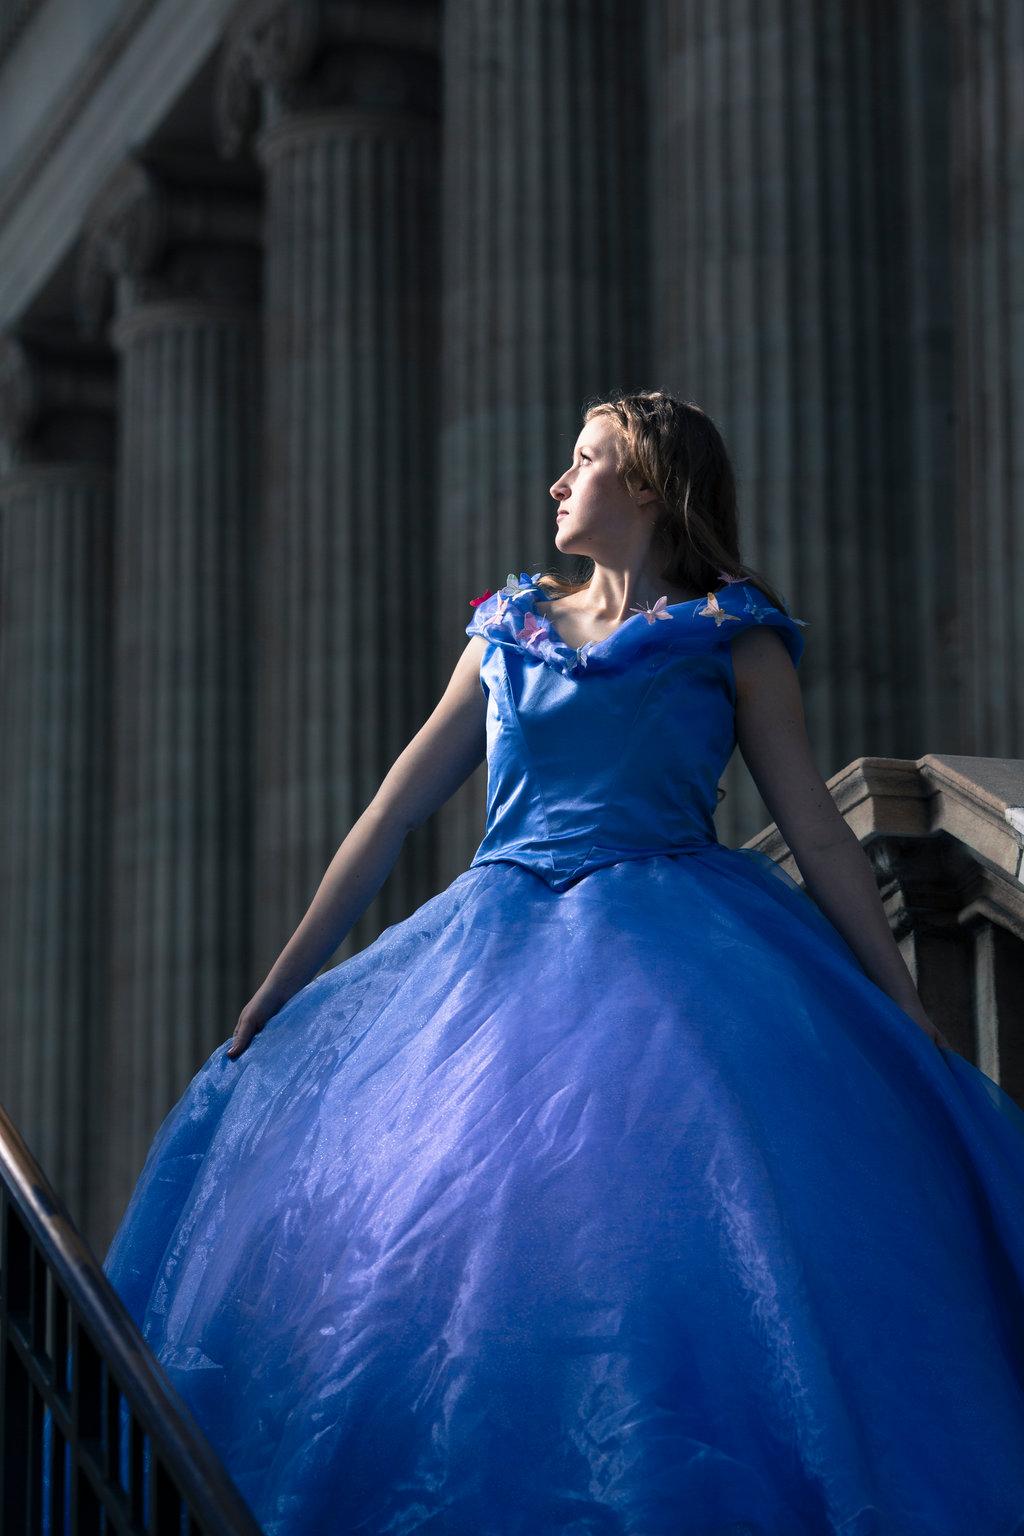 Cinderella Ball Gown Tutorial Adafruit Industries Makers Hackers Artists Designers And Engineers